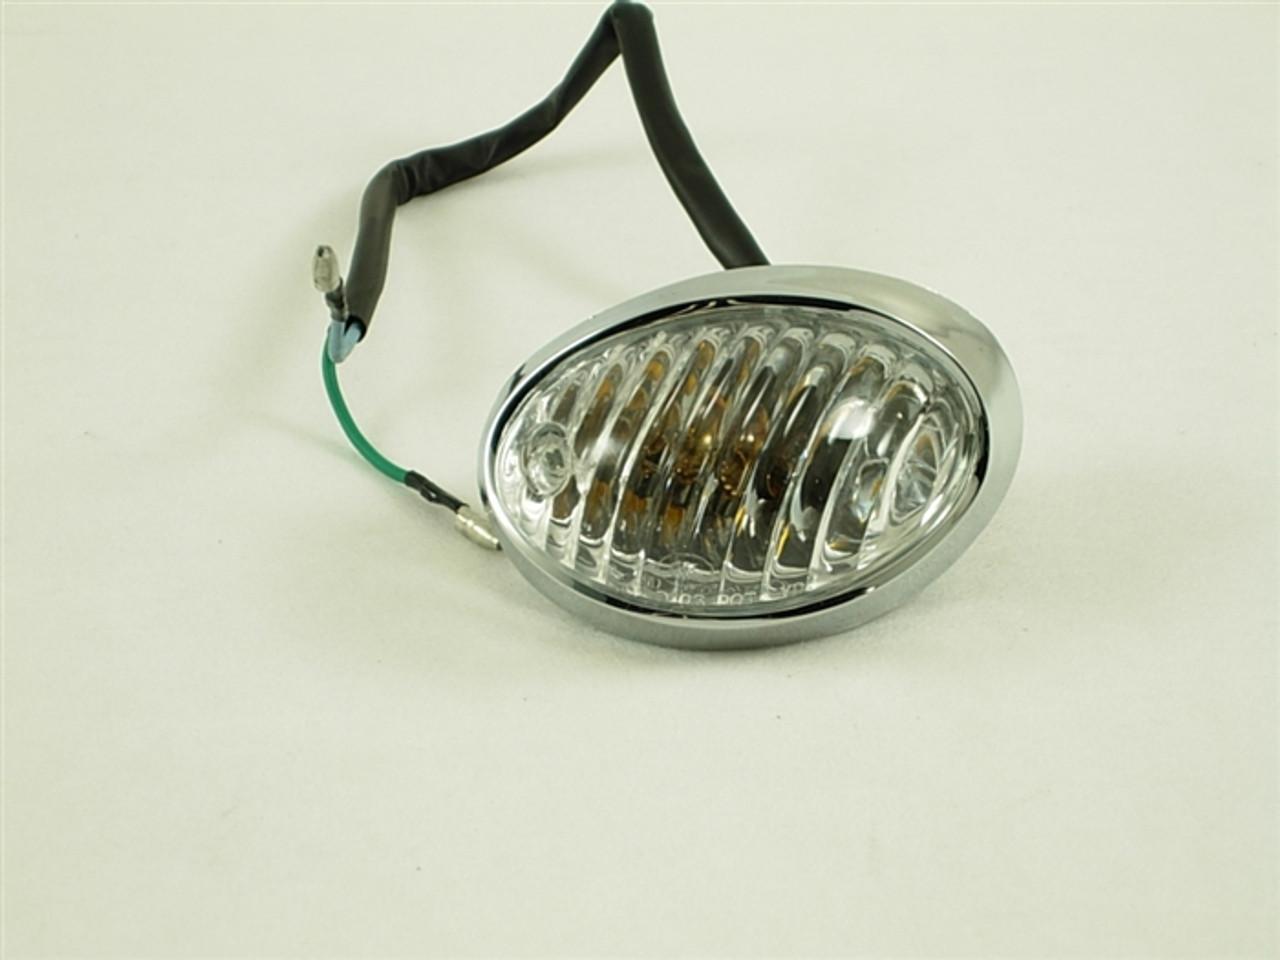 SIGNAL LIGHT ASSEMBLY (SET) FRONT 11657-A93-1